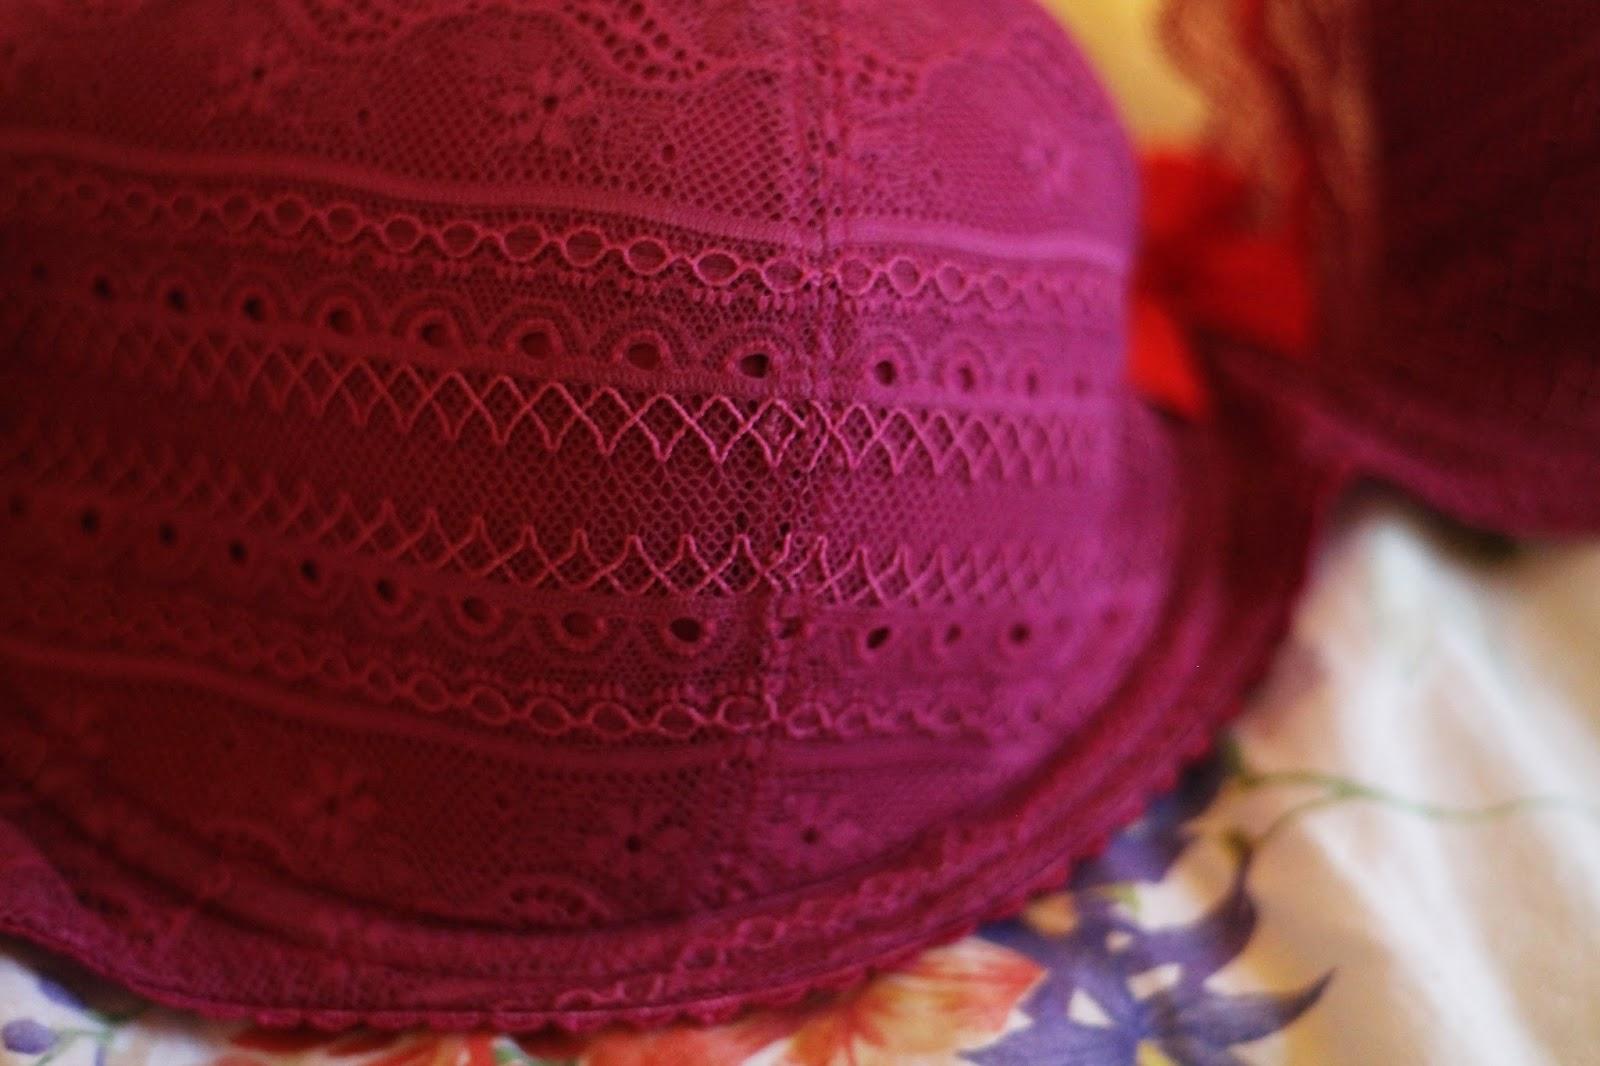 Purple Breast - Womens Health - MedHelp